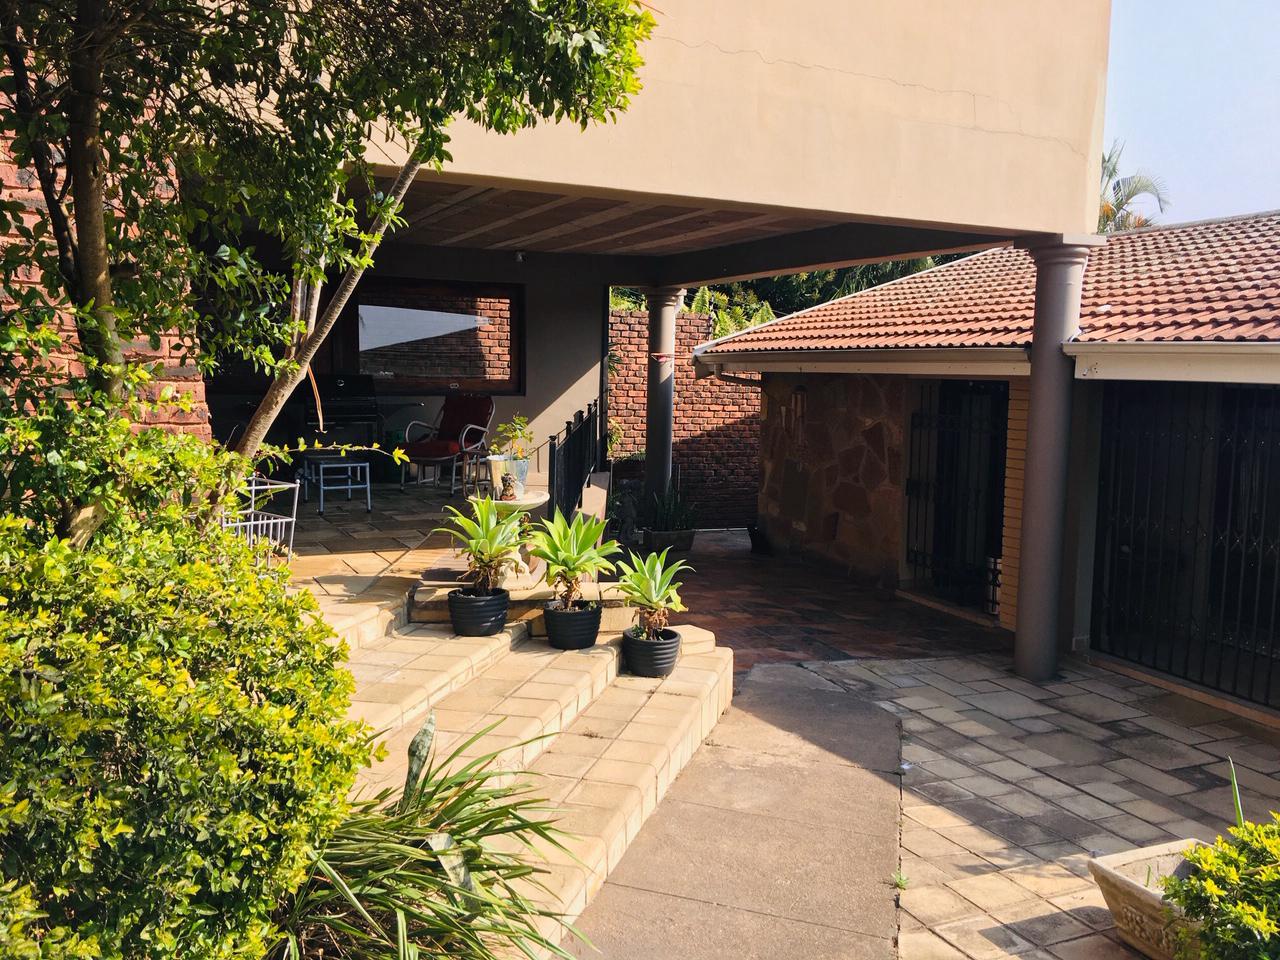 3 Bedroom House For Sale in Morningside